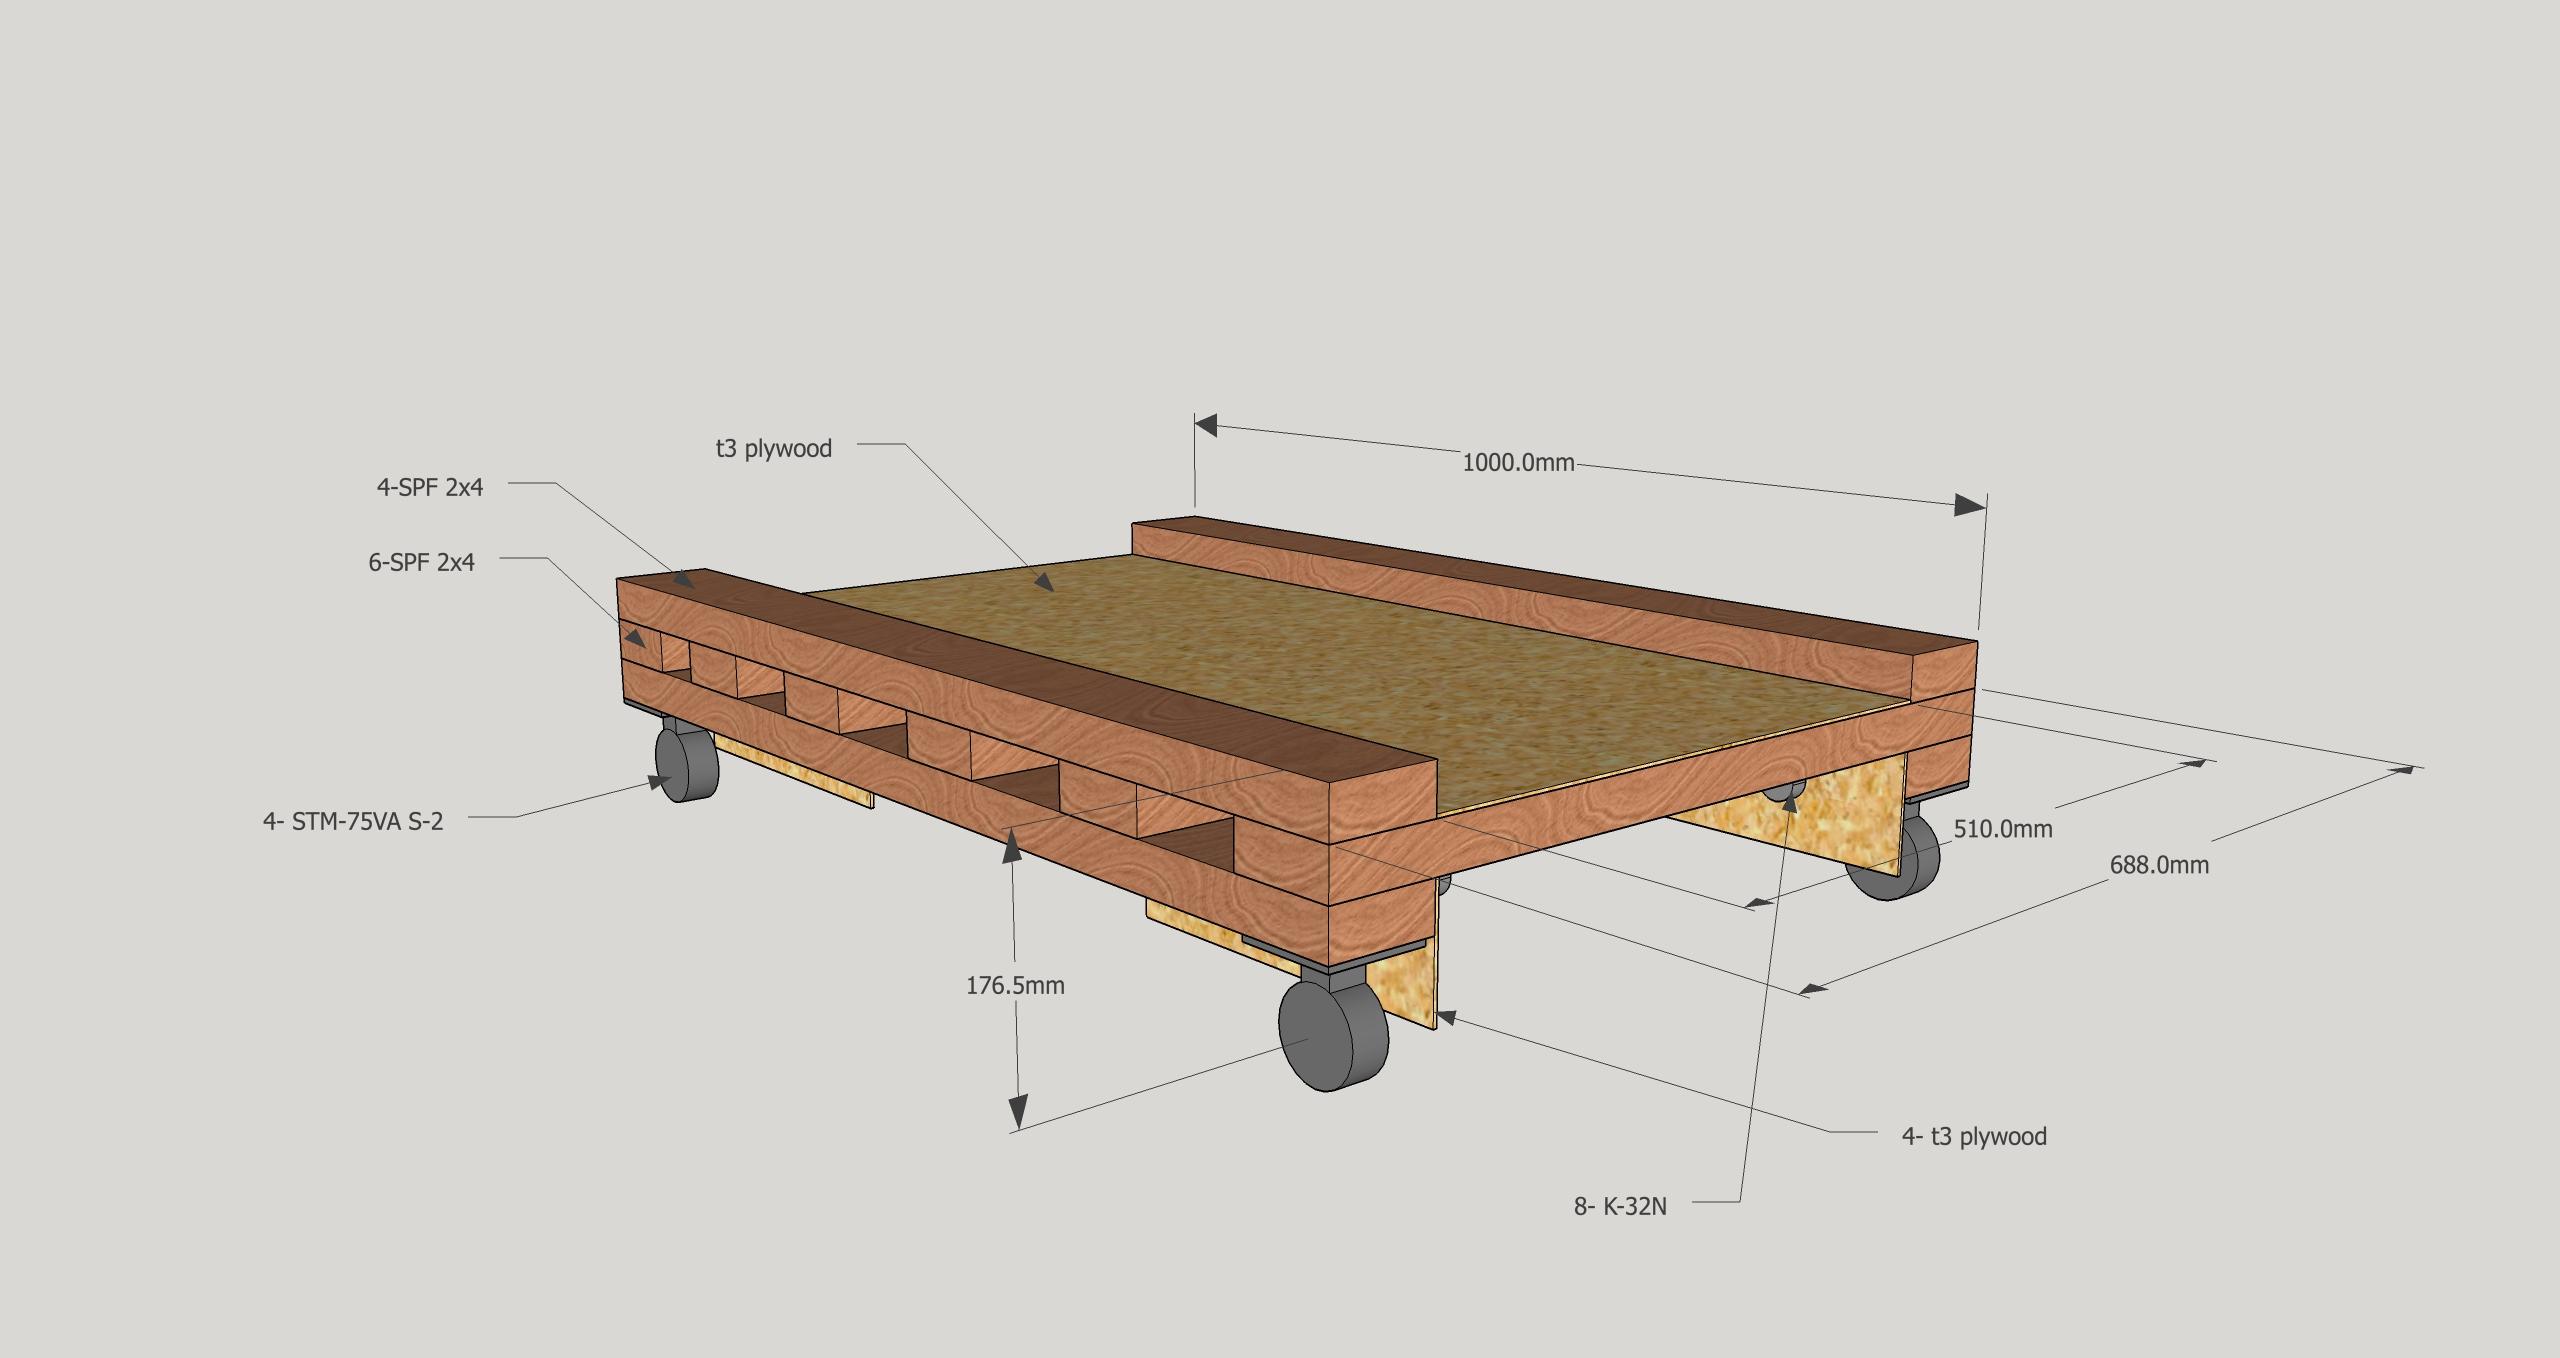 SketchUpモデル 木製パレット台車